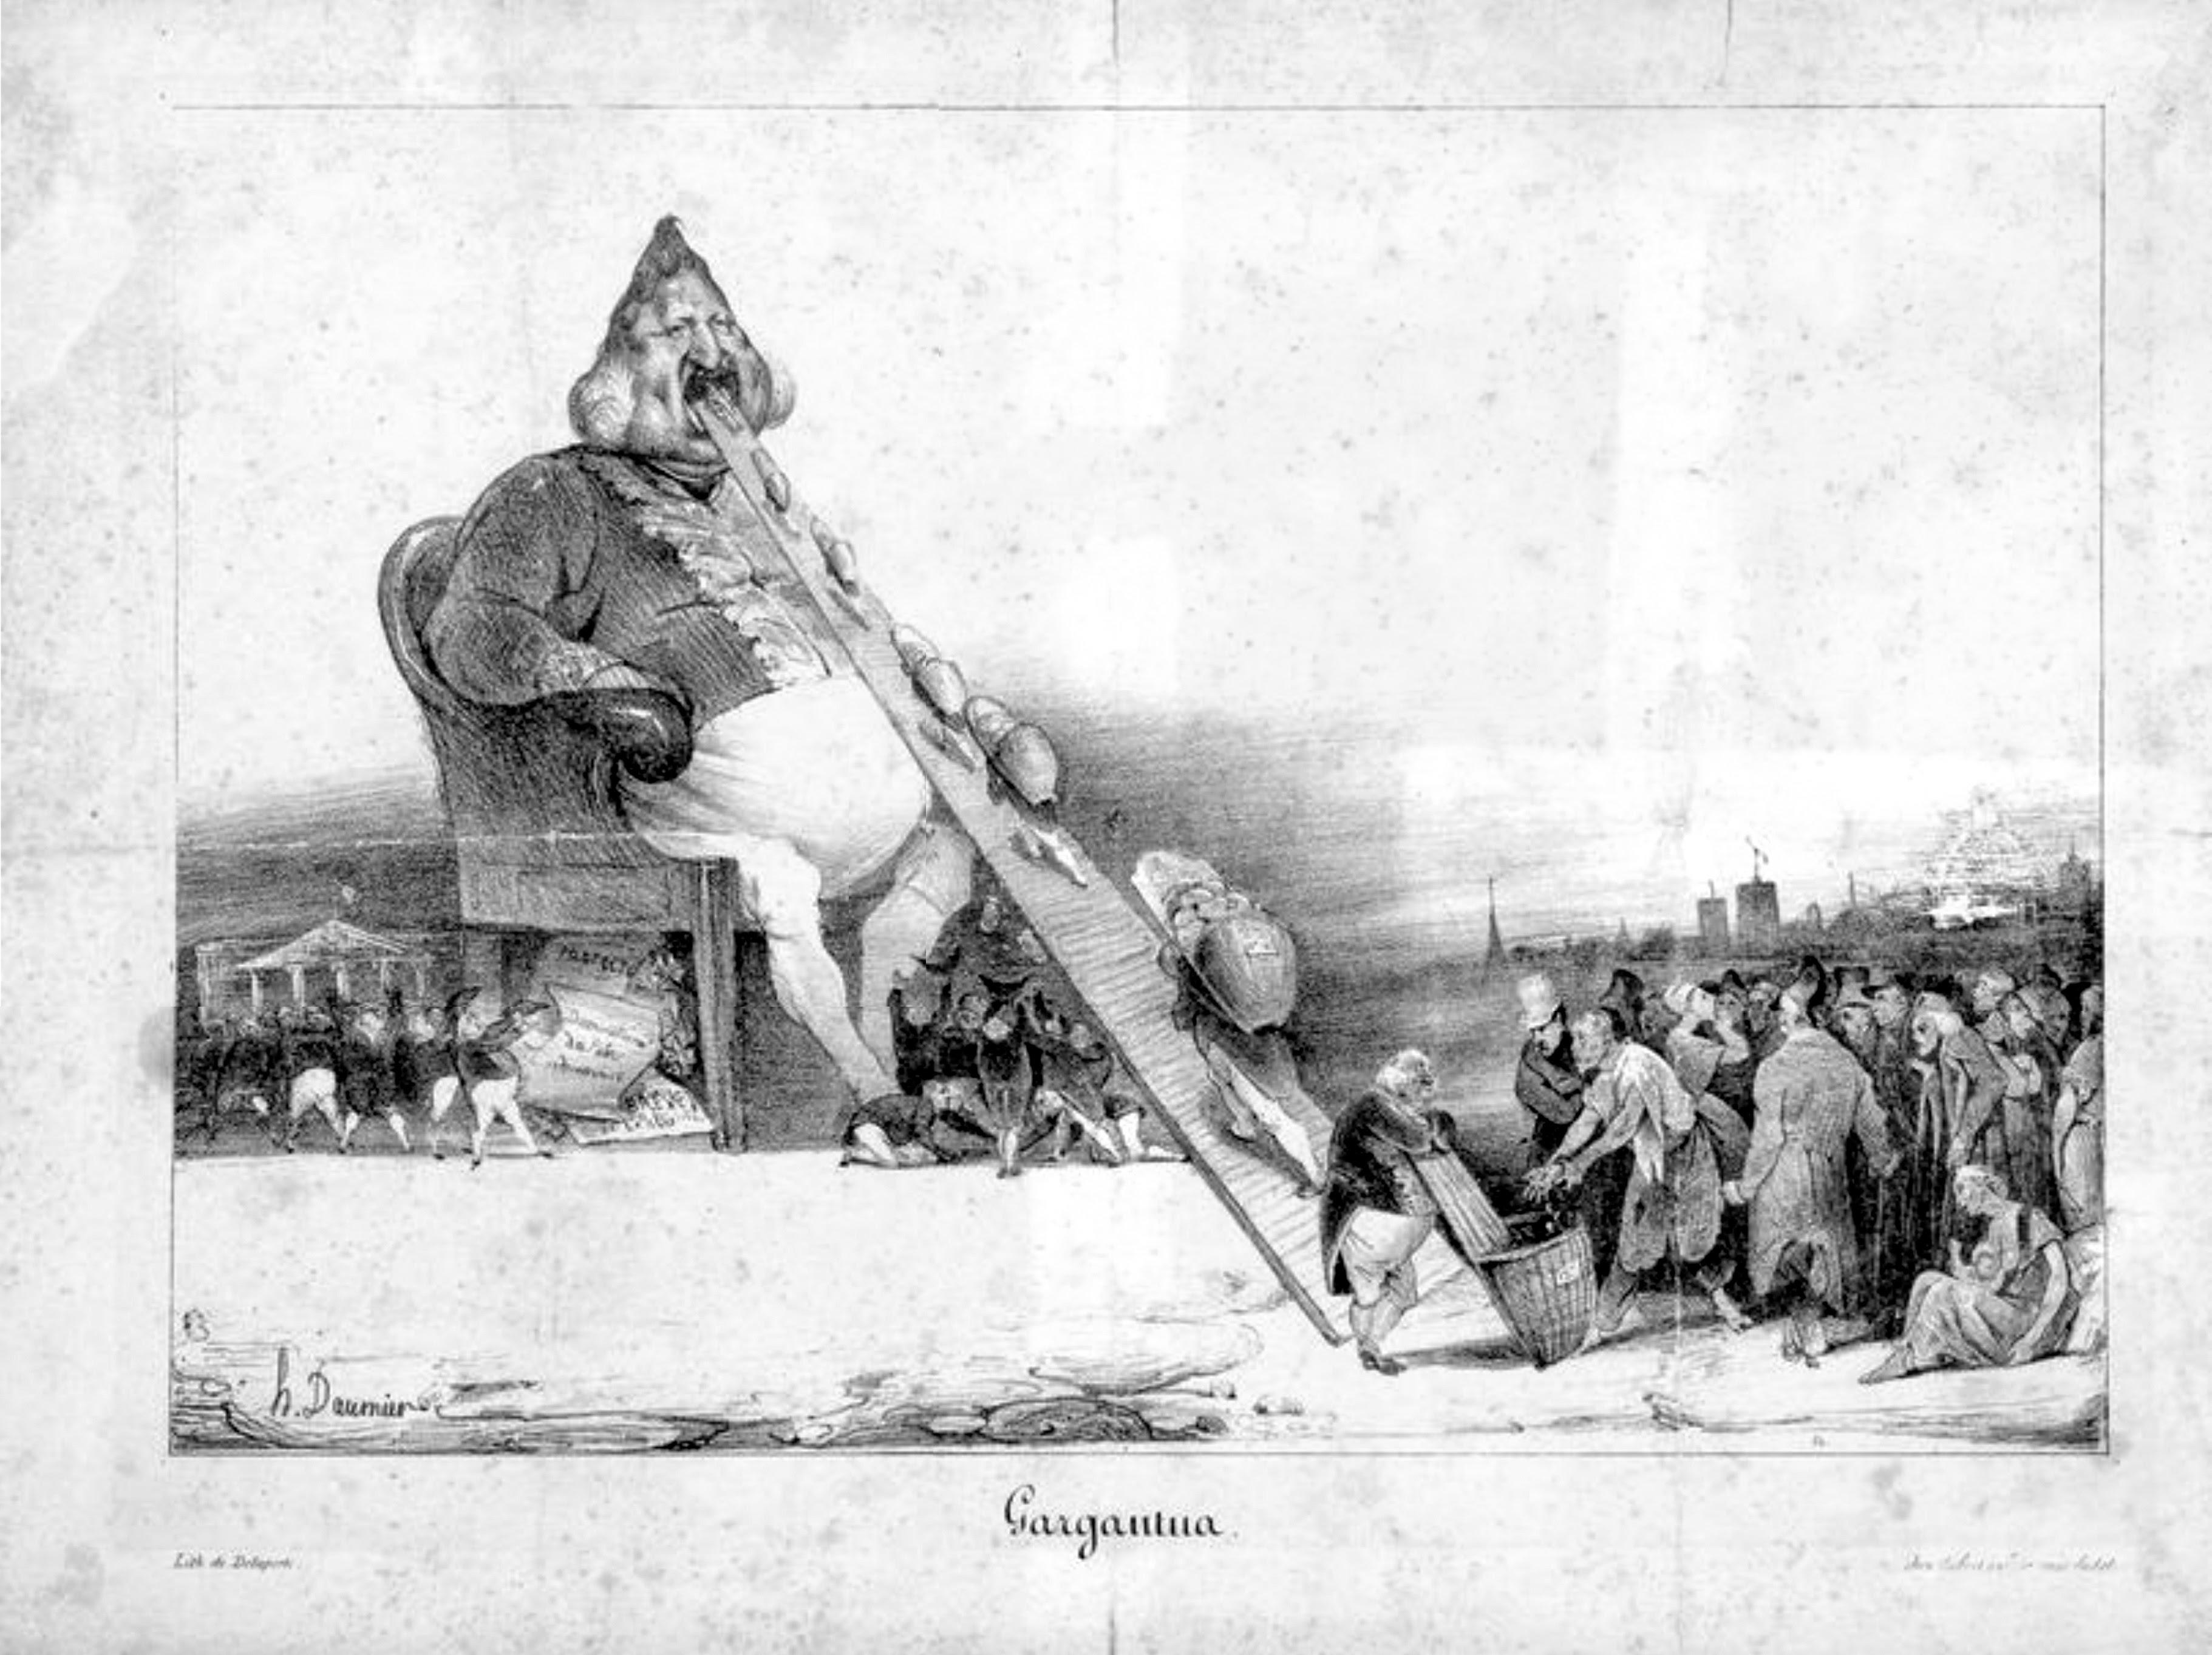 Image:Honoré Daumier - Gargantua.jpg